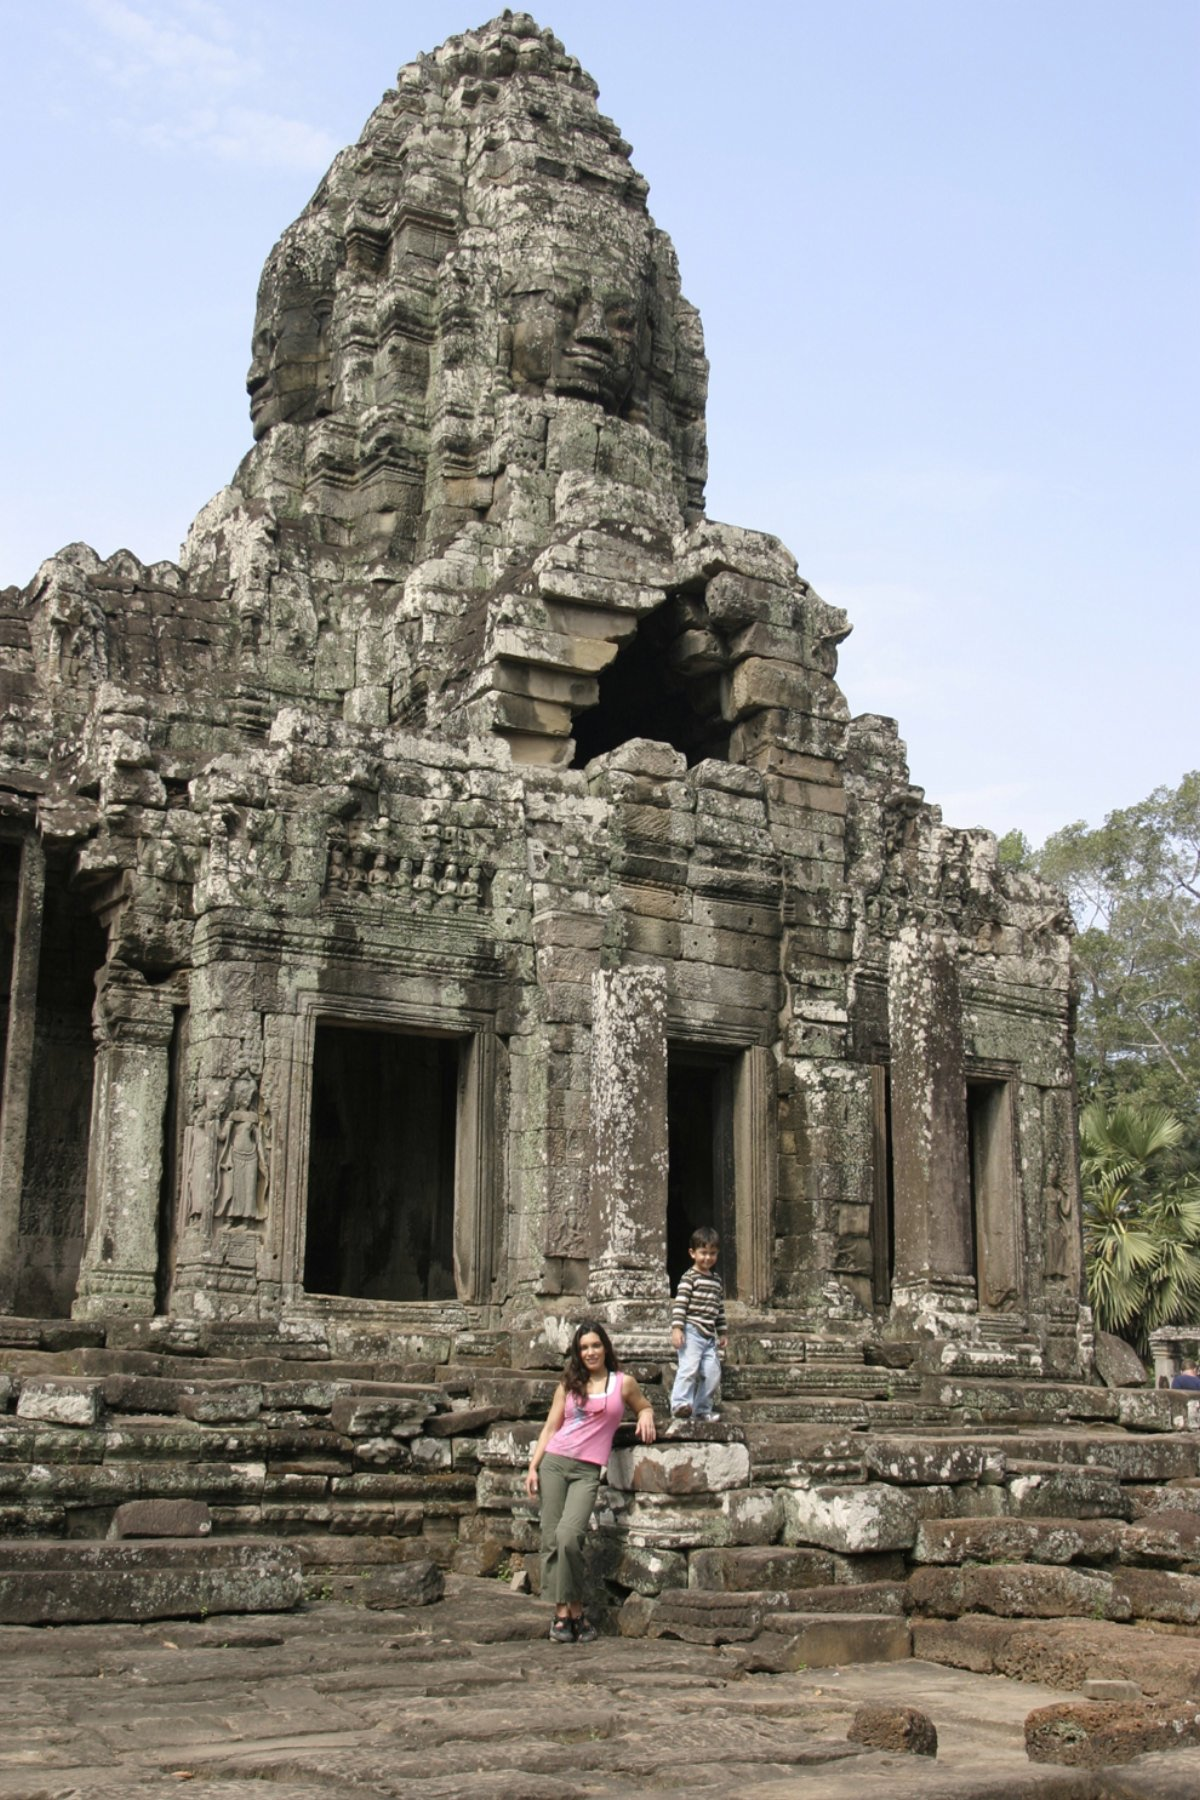 resized-cambodia-ld-cat-temple10-23-2011